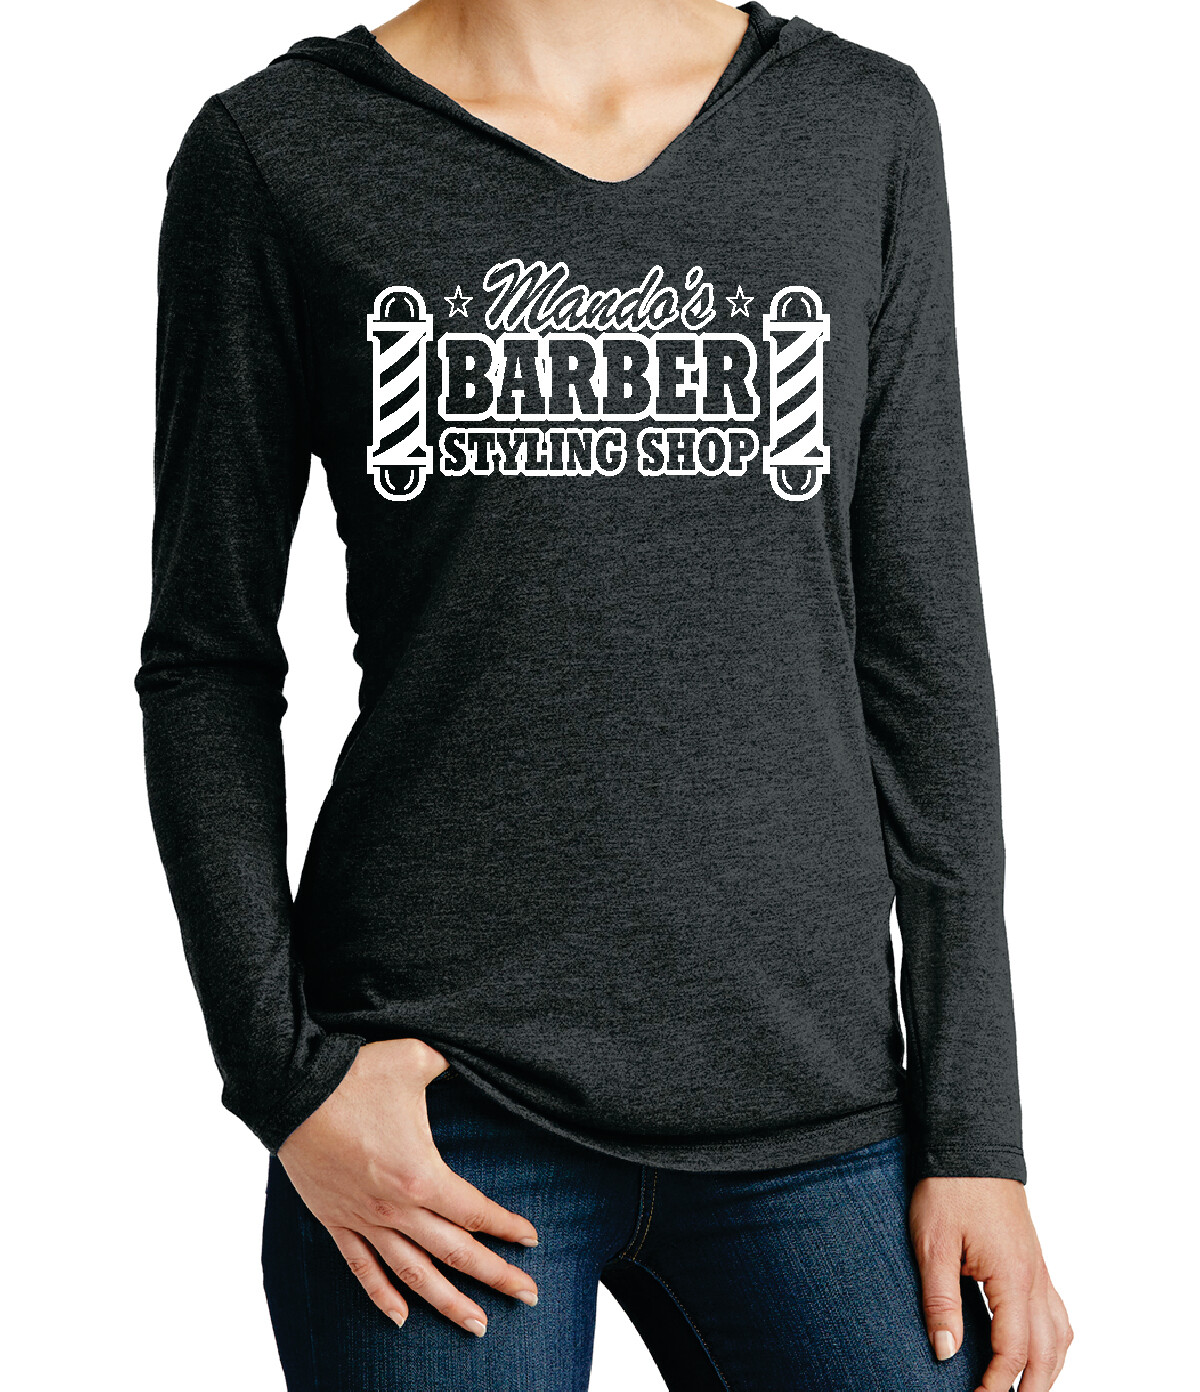 Mando's Barber Shop Women's Soft Long Sleeve Hoodie